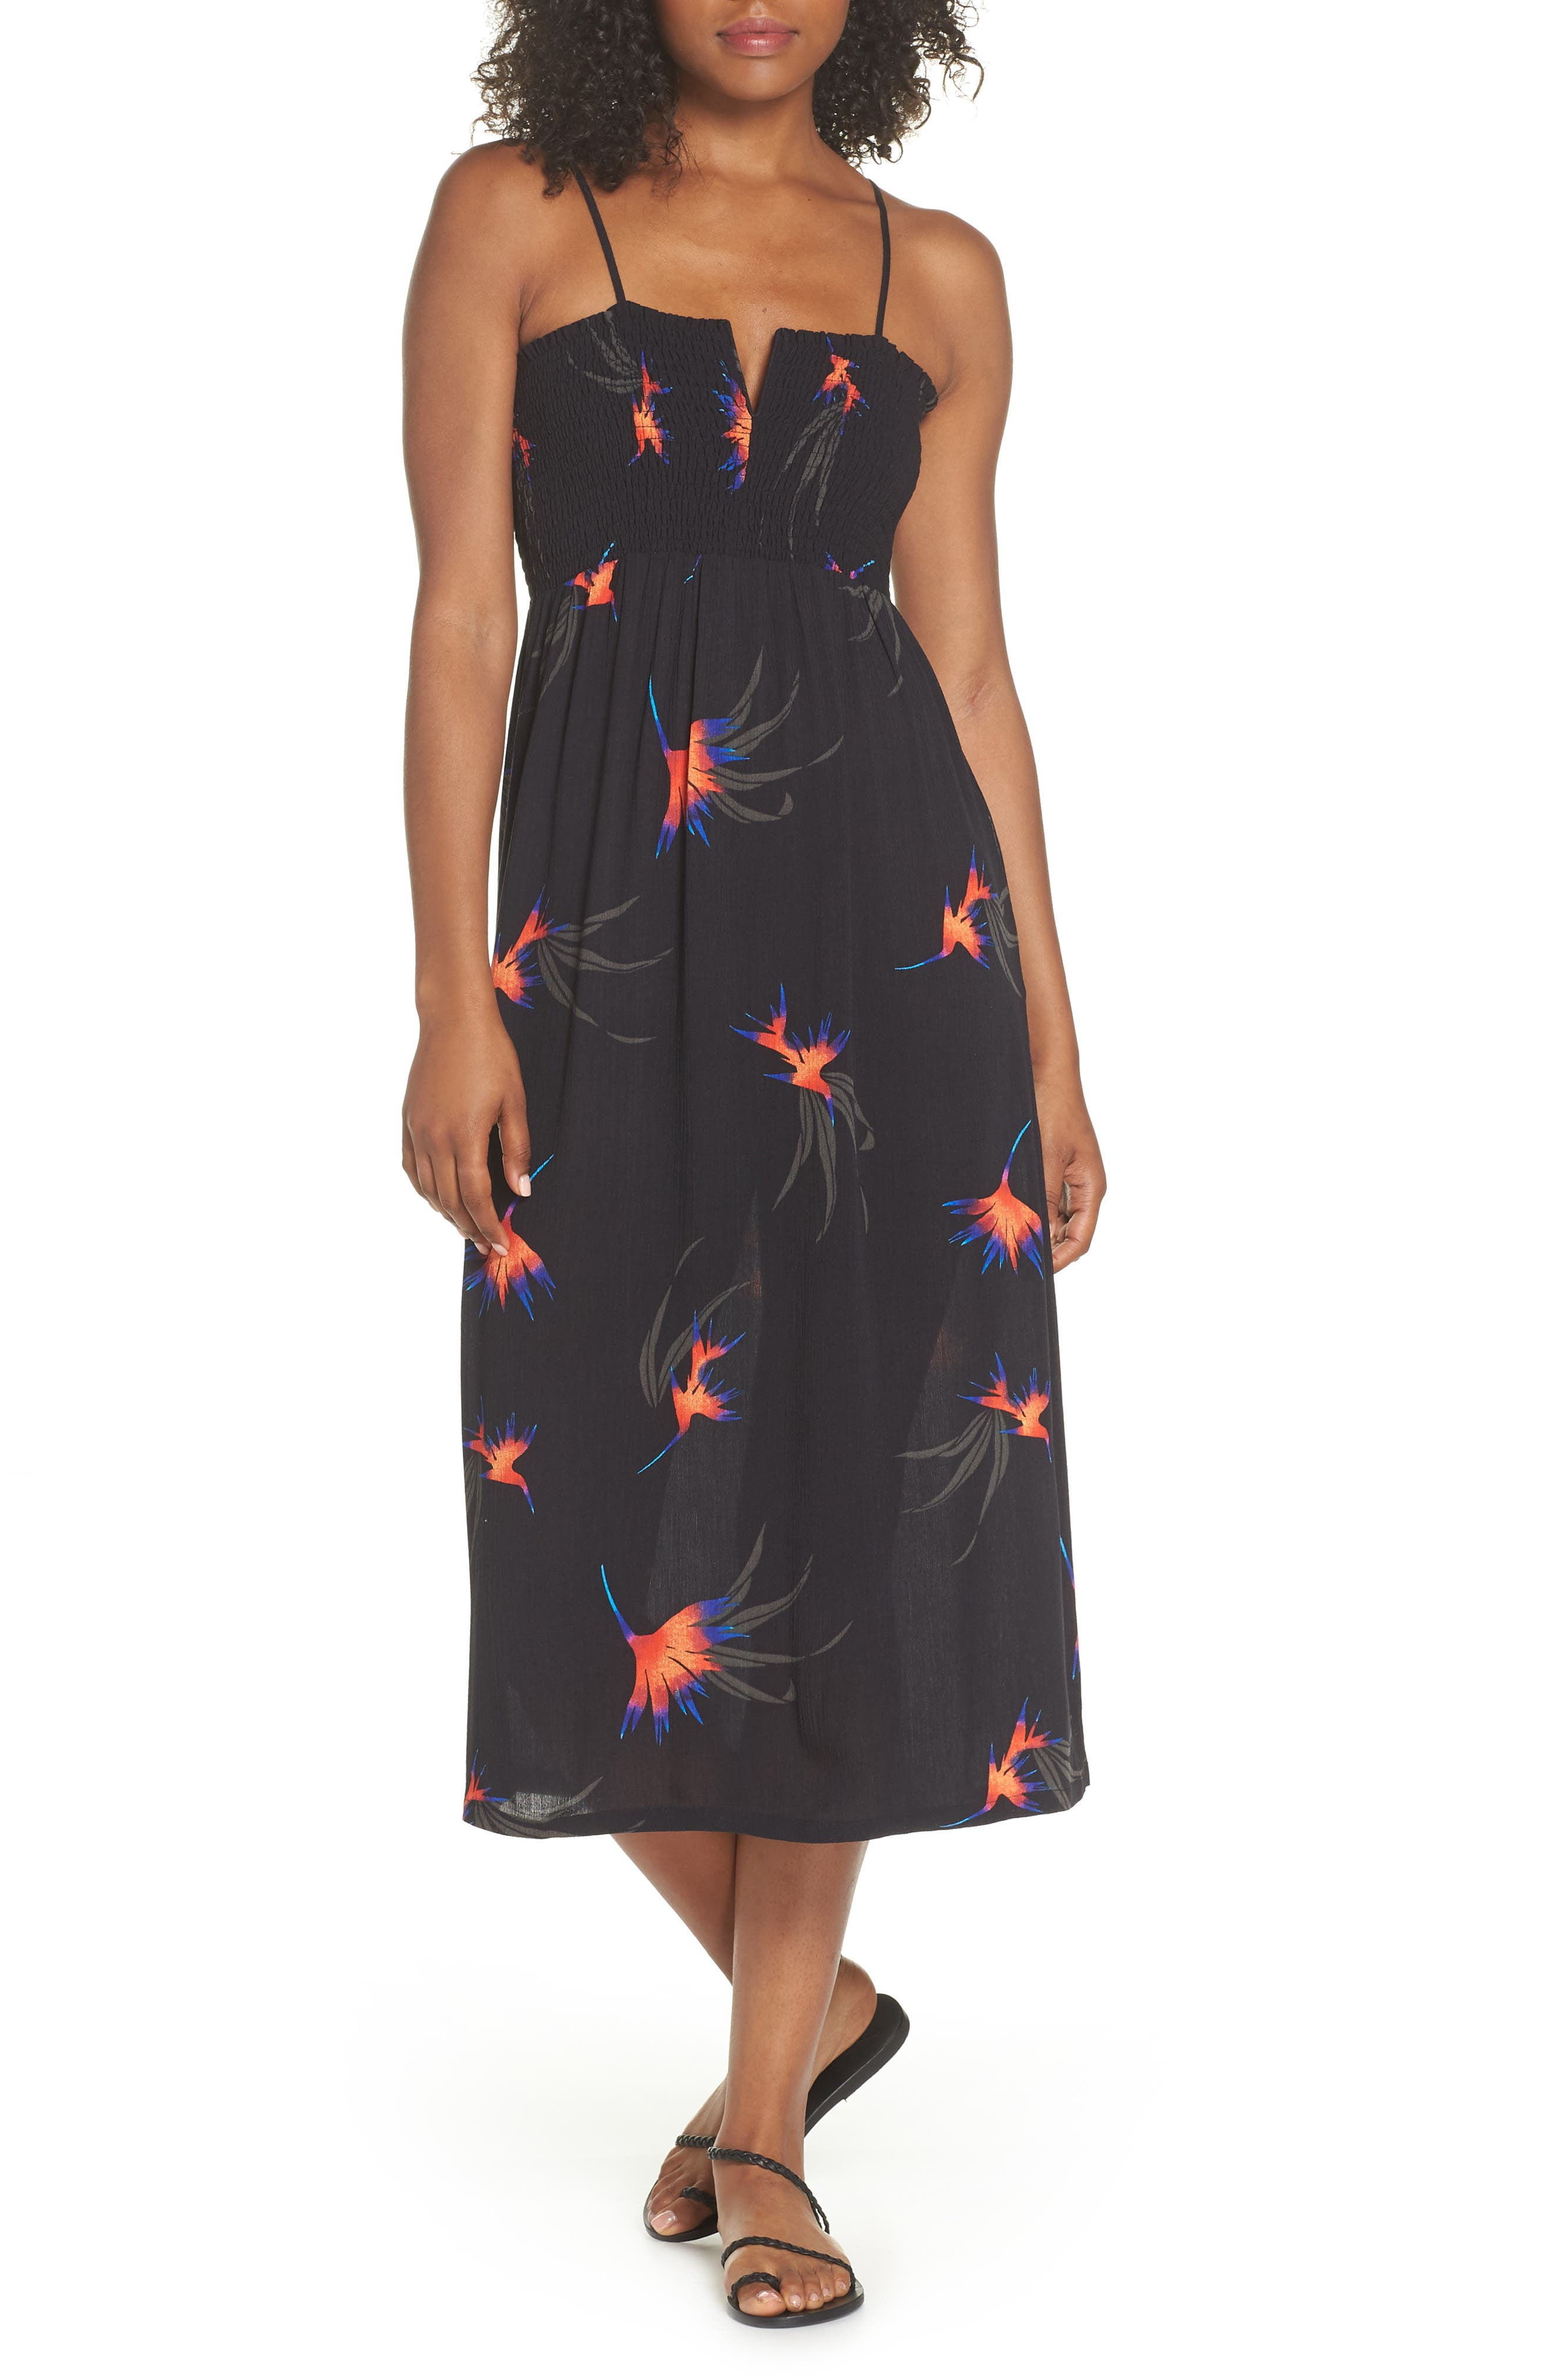 Sydney Midi Dress,                             Main thumbnail 1, color,                             Black Paradise City Print